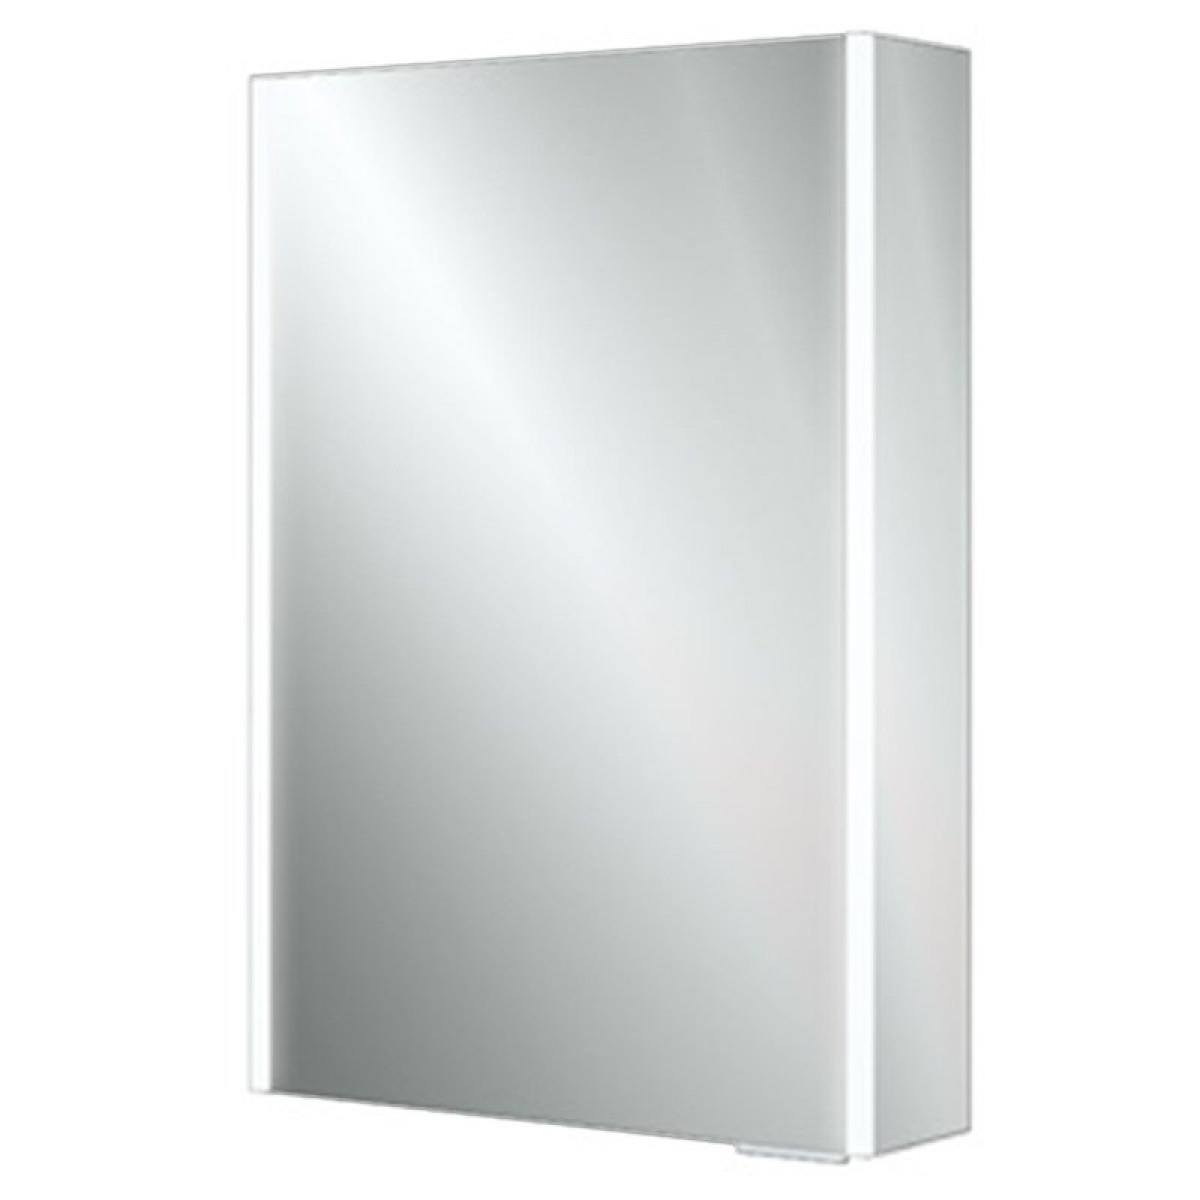 hib bathroom cabinets hib aluminium cabinets hib xenon 50 led